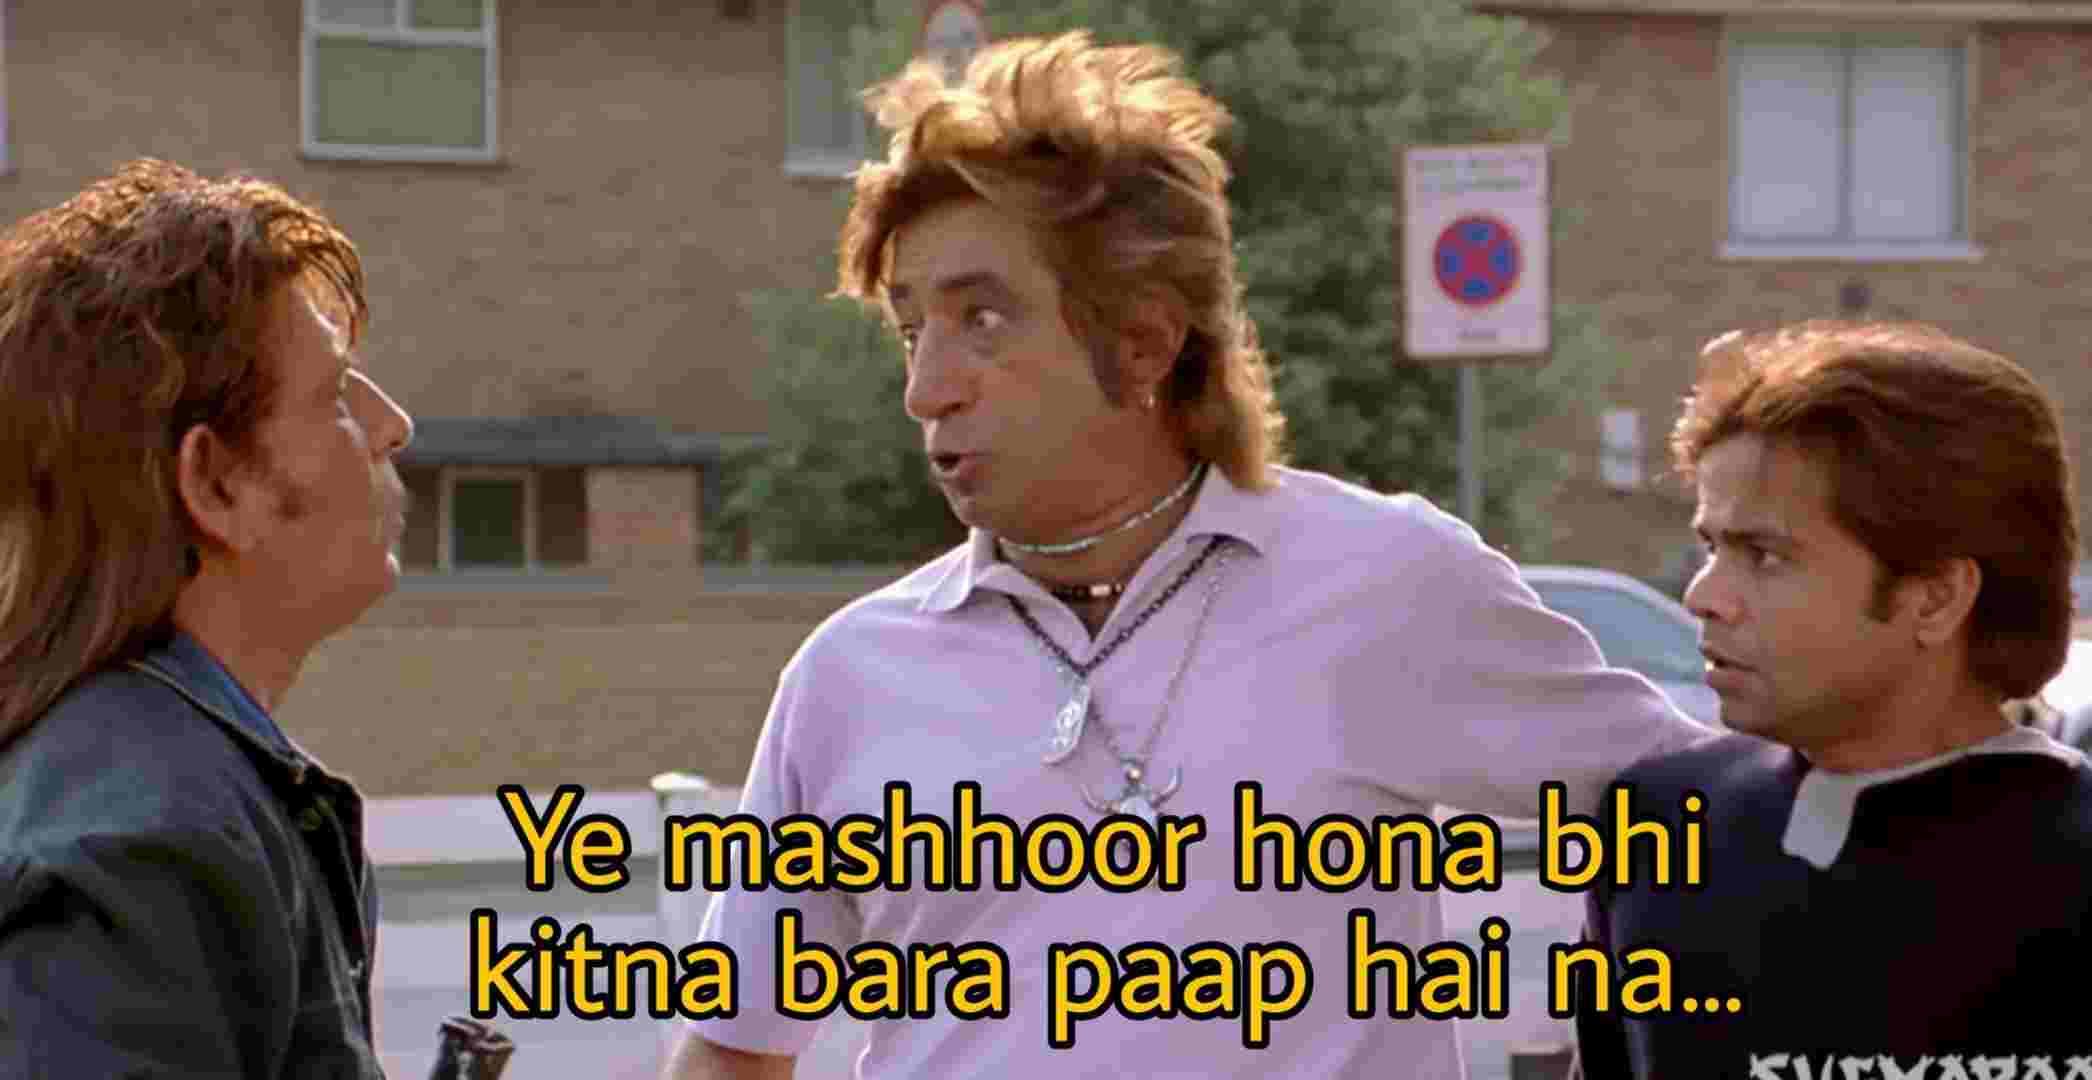 yeh mashoor hona bhi paap hai Shakti Kapoor meme template